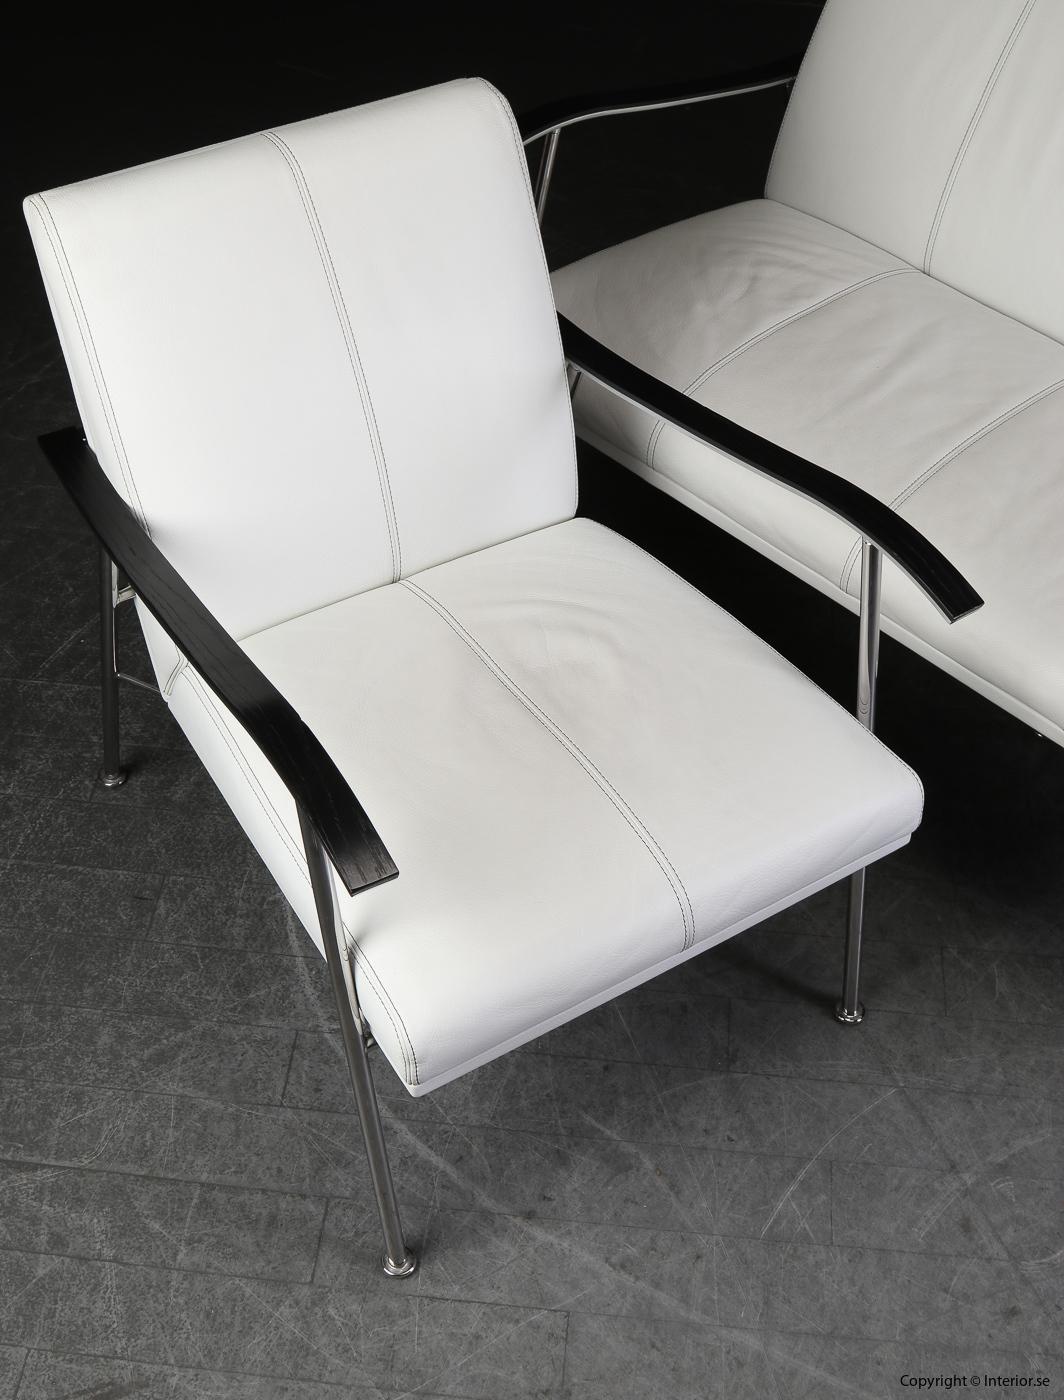 Soffgrupp armchair sofa, Lammhults Sahara i skinn - Gunilla Allard 3